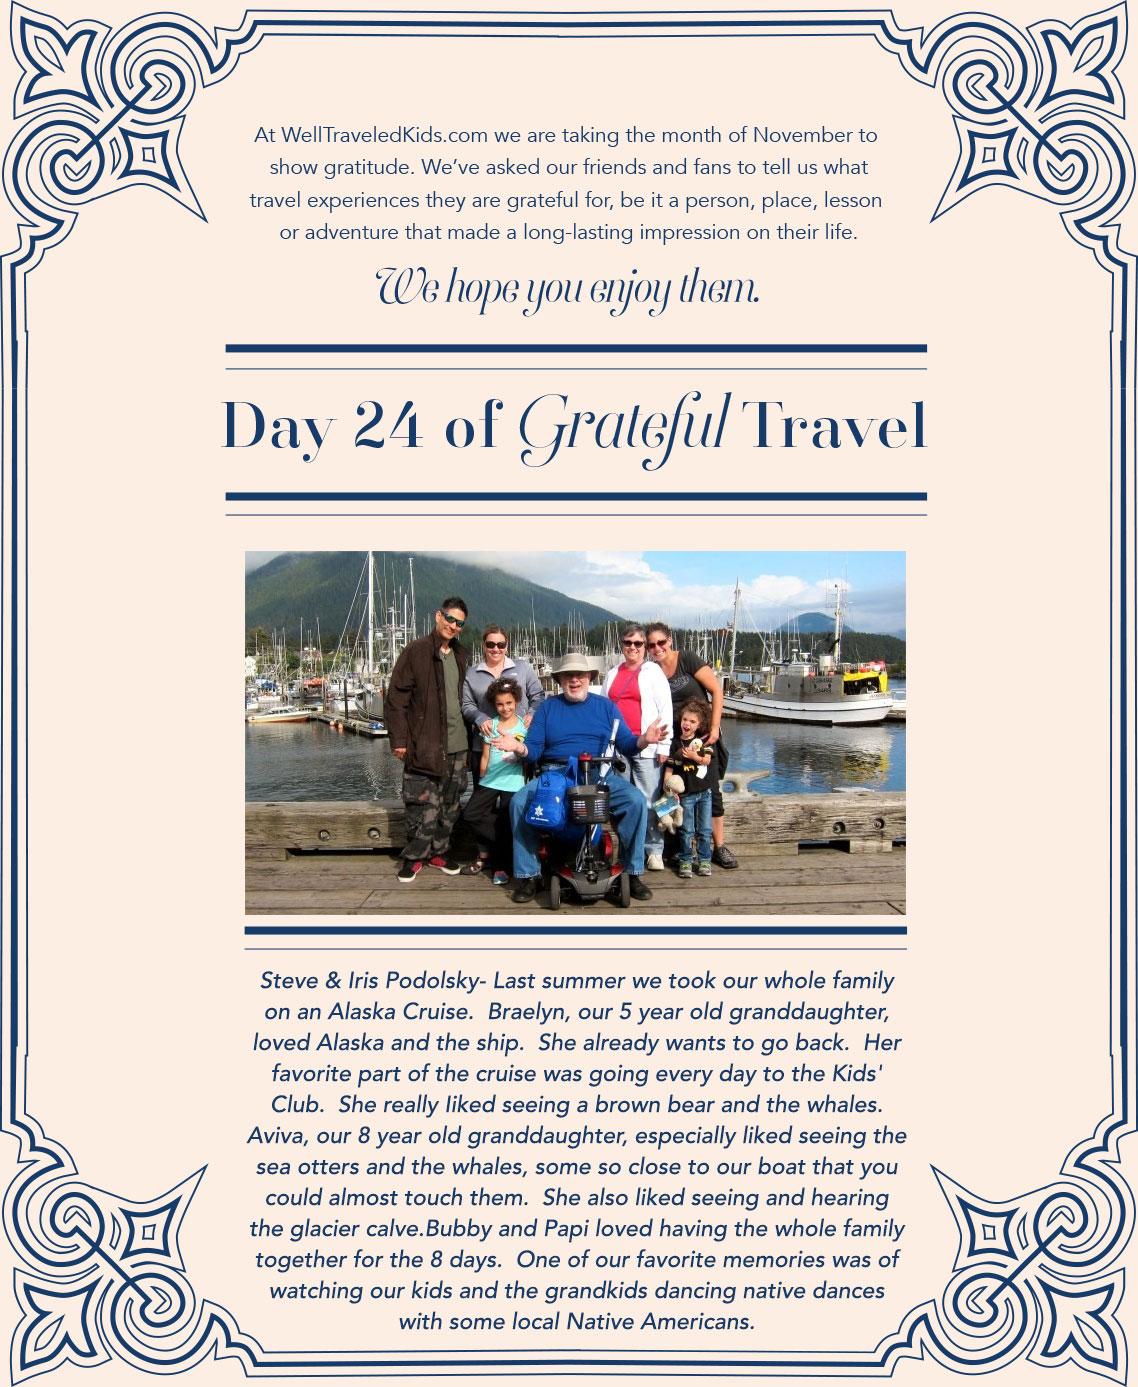 GratefulTravel_Day_24